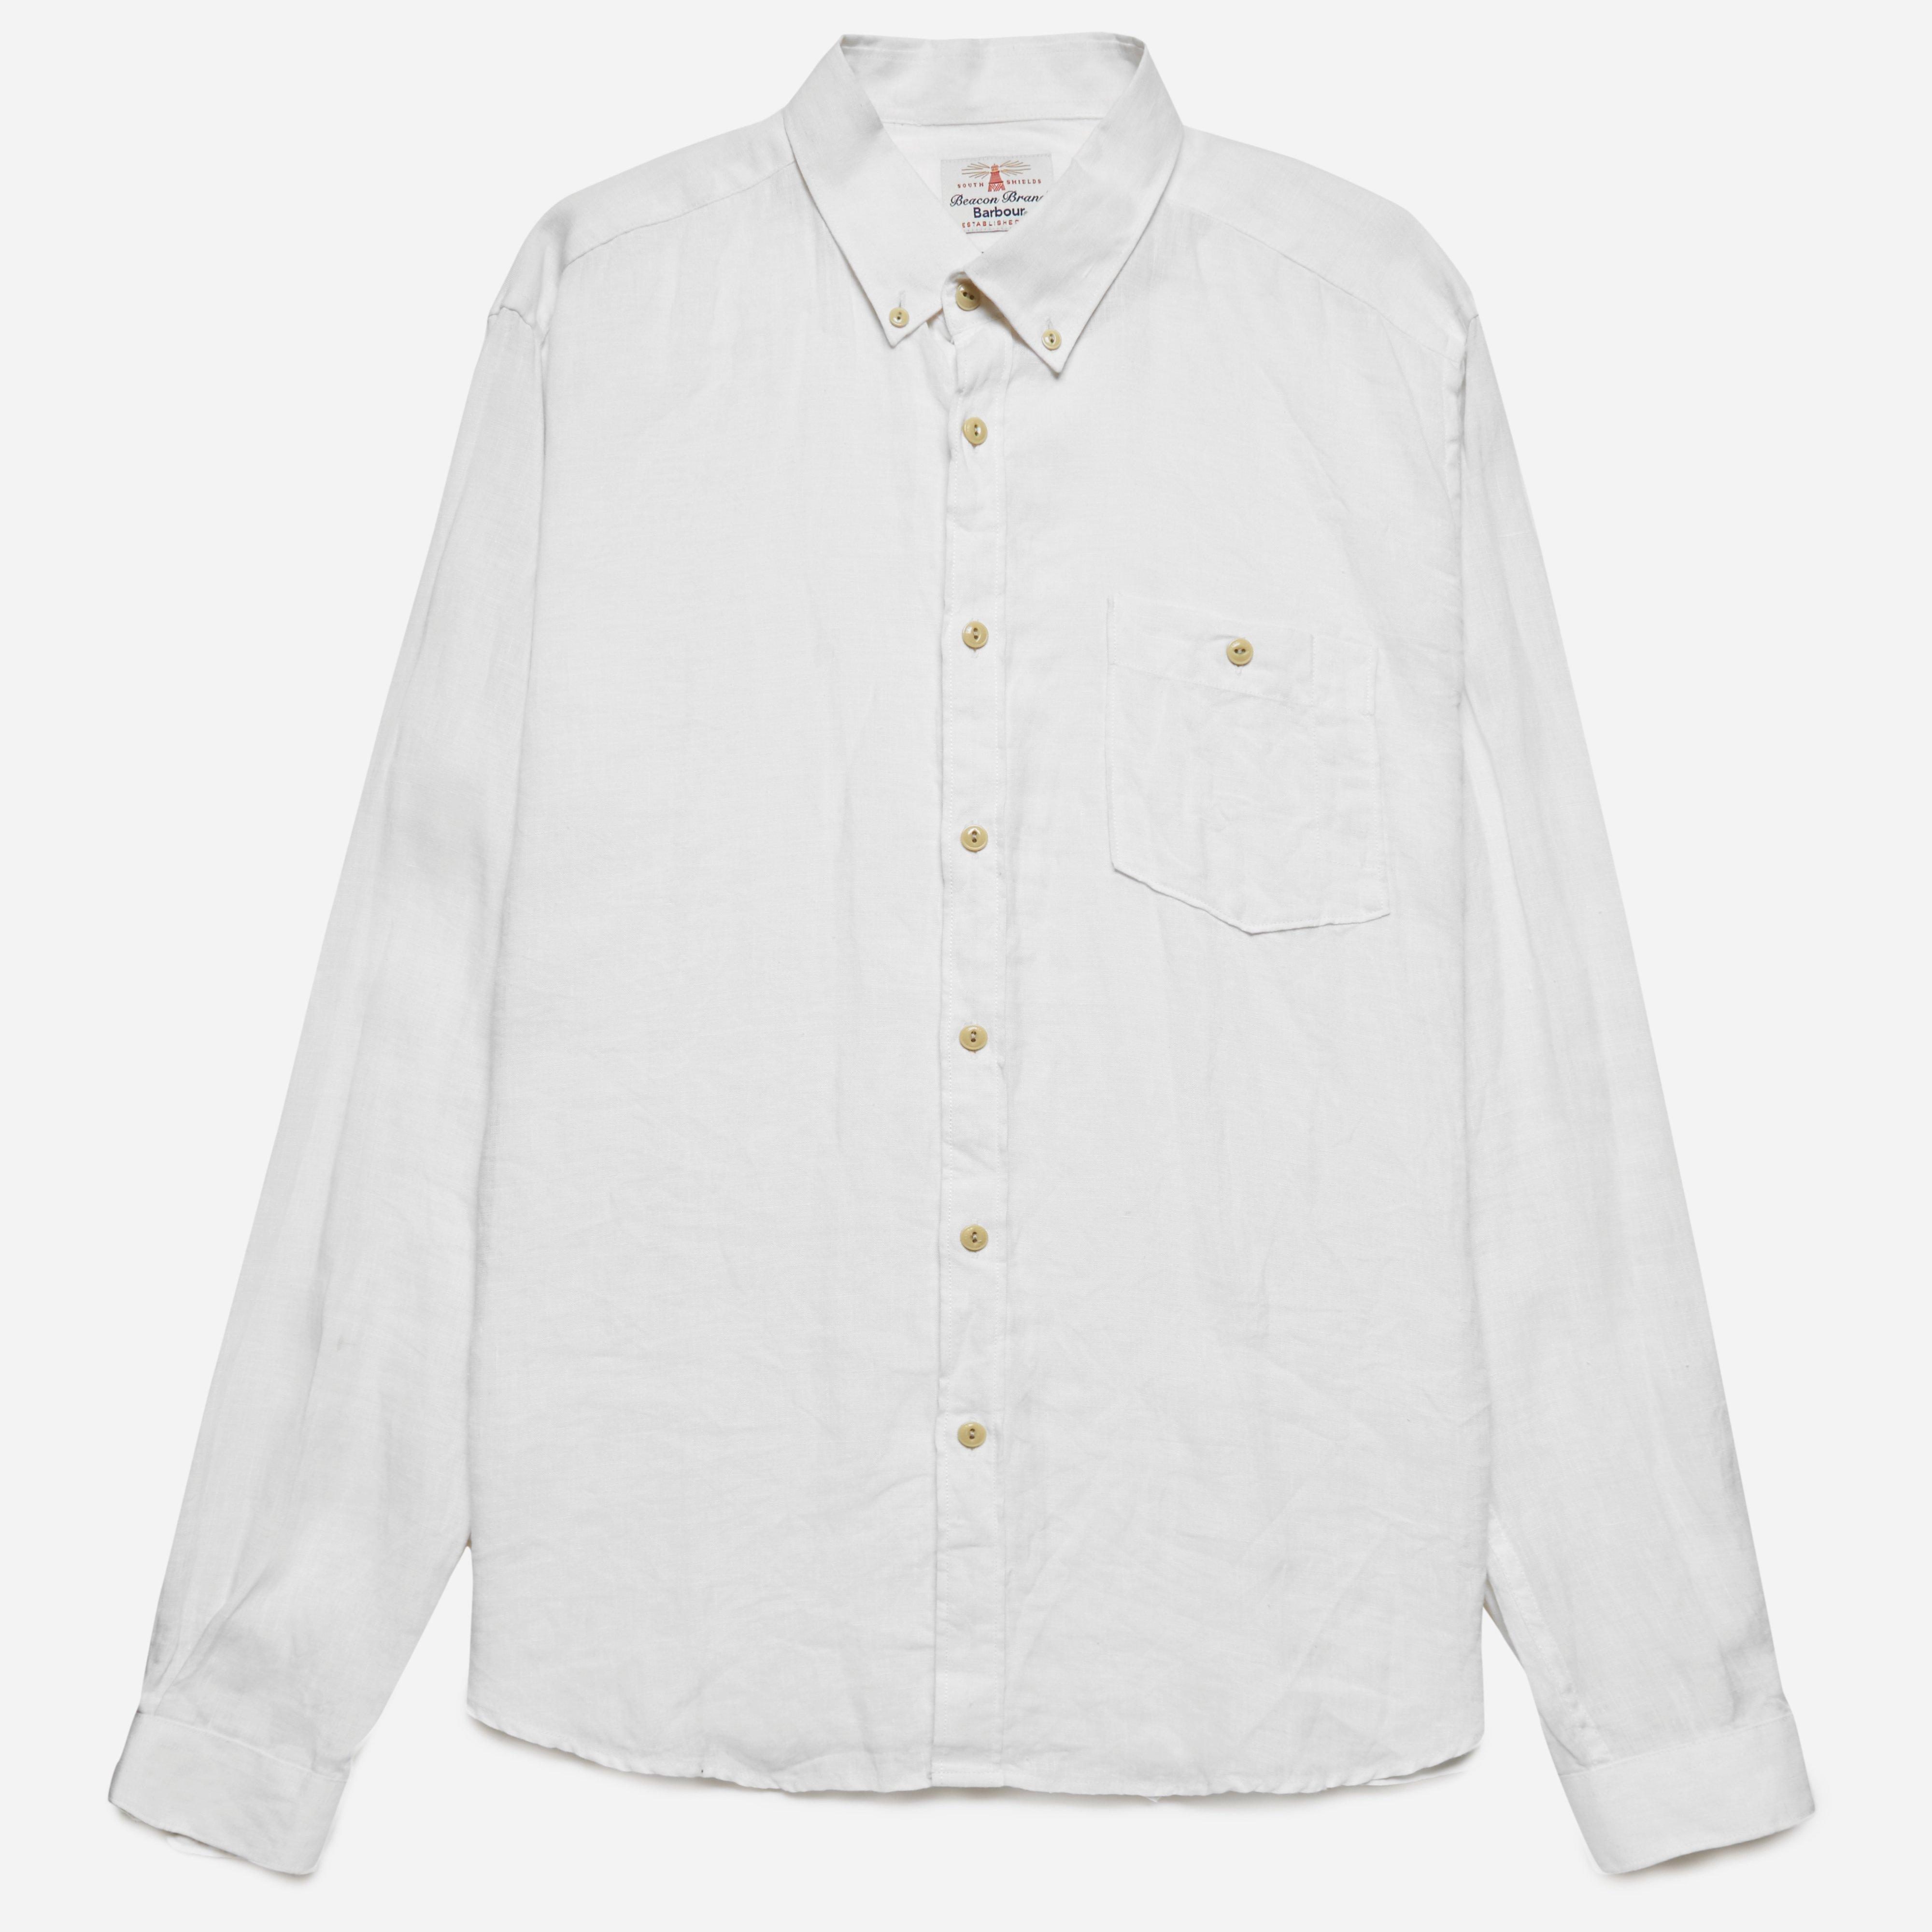 Barbour Edward Linen Shirt White